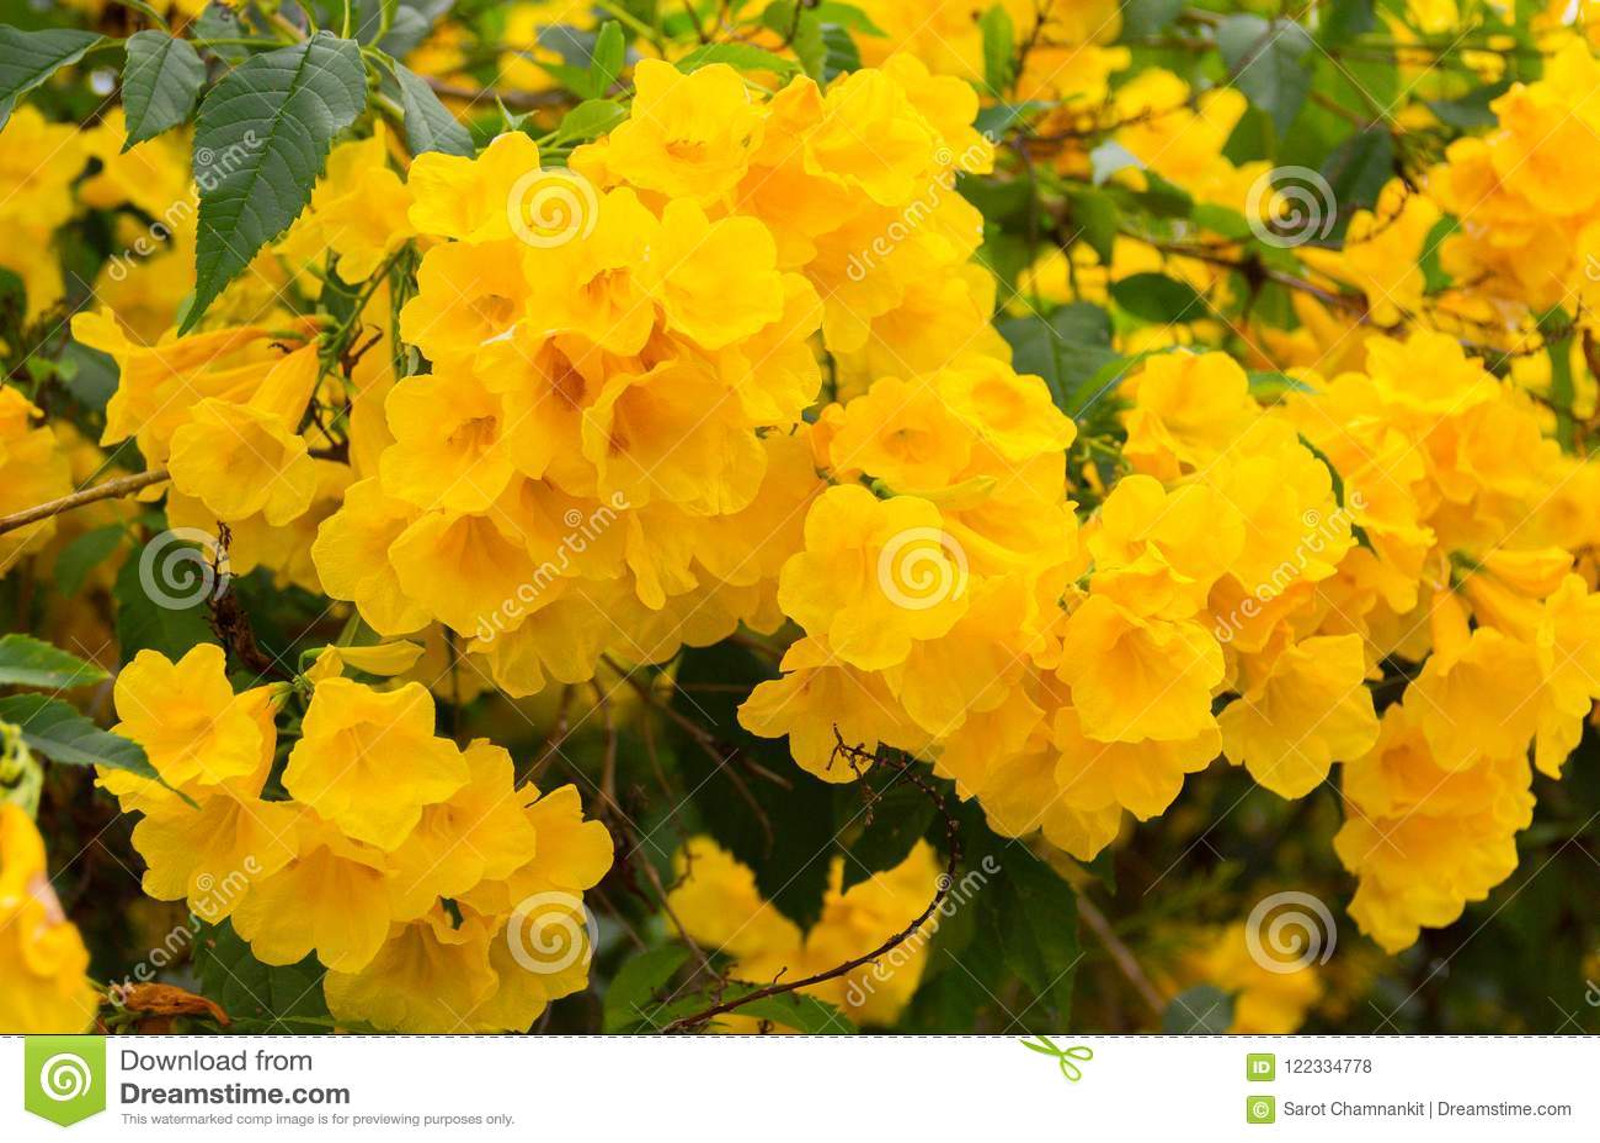 Yellow elder trumpetbush beautiful yellow flowers bloom on a tr yellow elder trumpetbush scientific name tecoma stans beautiful yellow flowers bloom on a tree in the garden on a natural background mightylinksfo